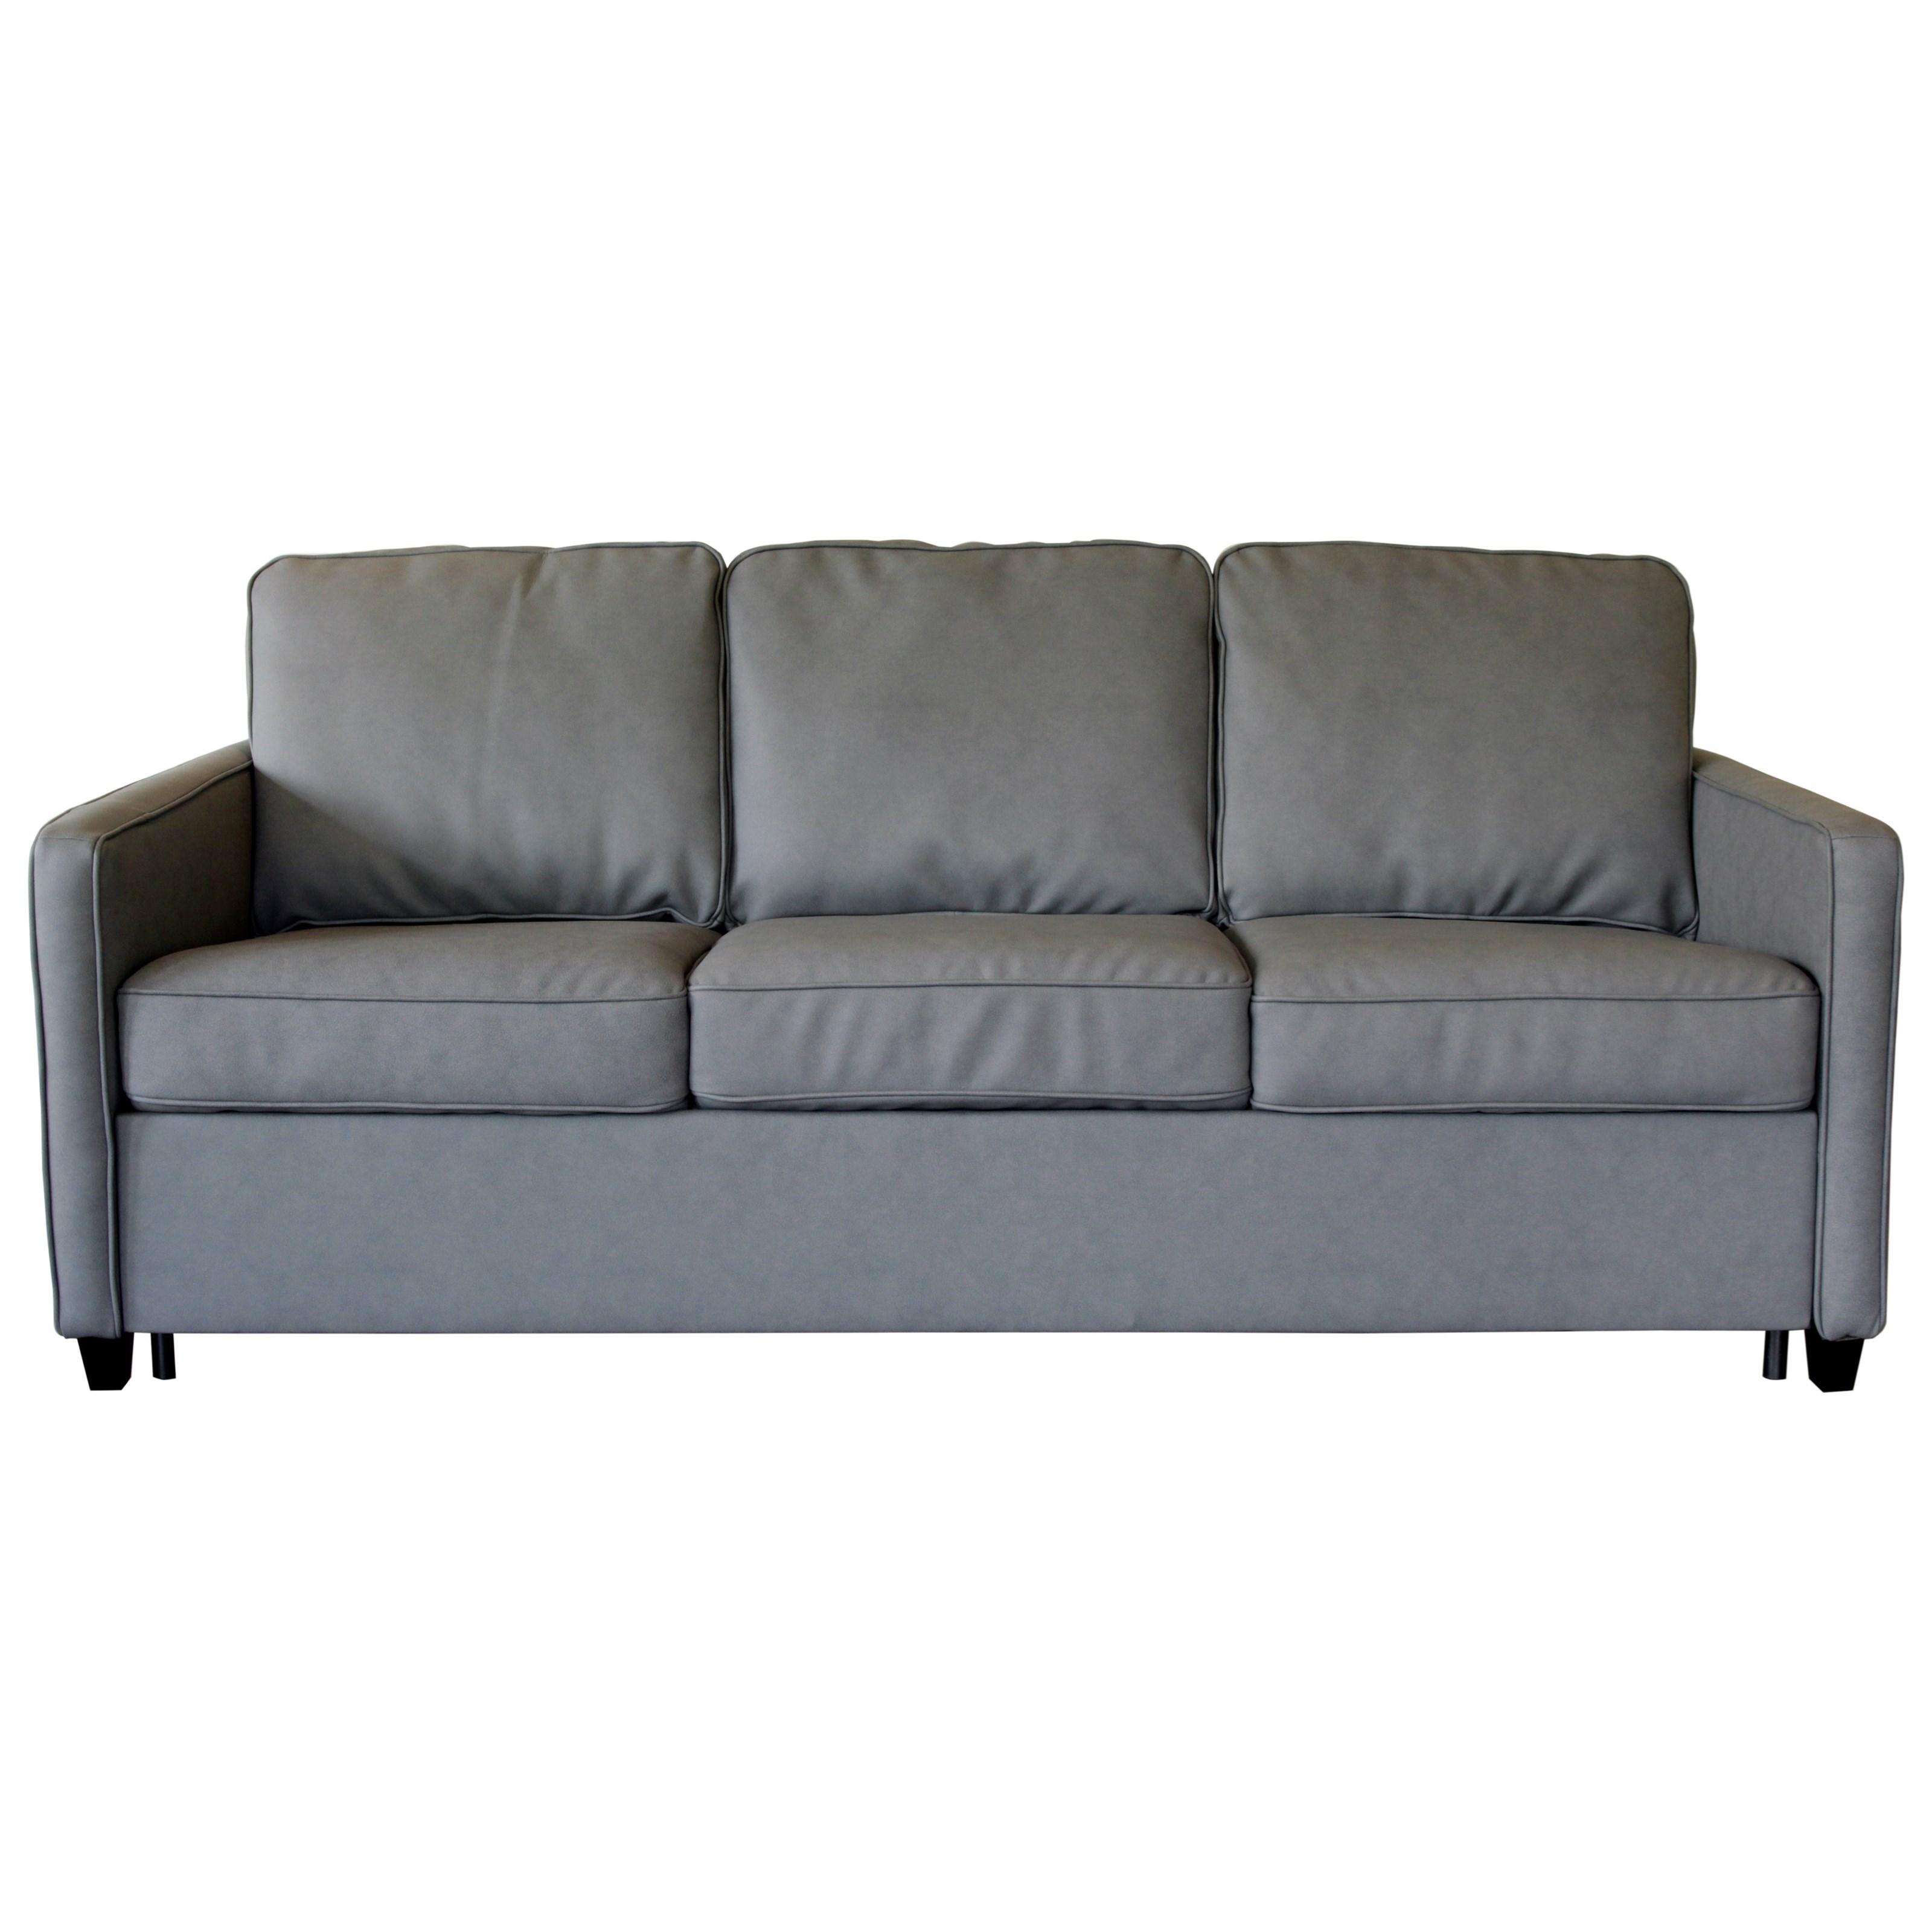 California Queen Sofa Sleeper by Palliser at Red Knot